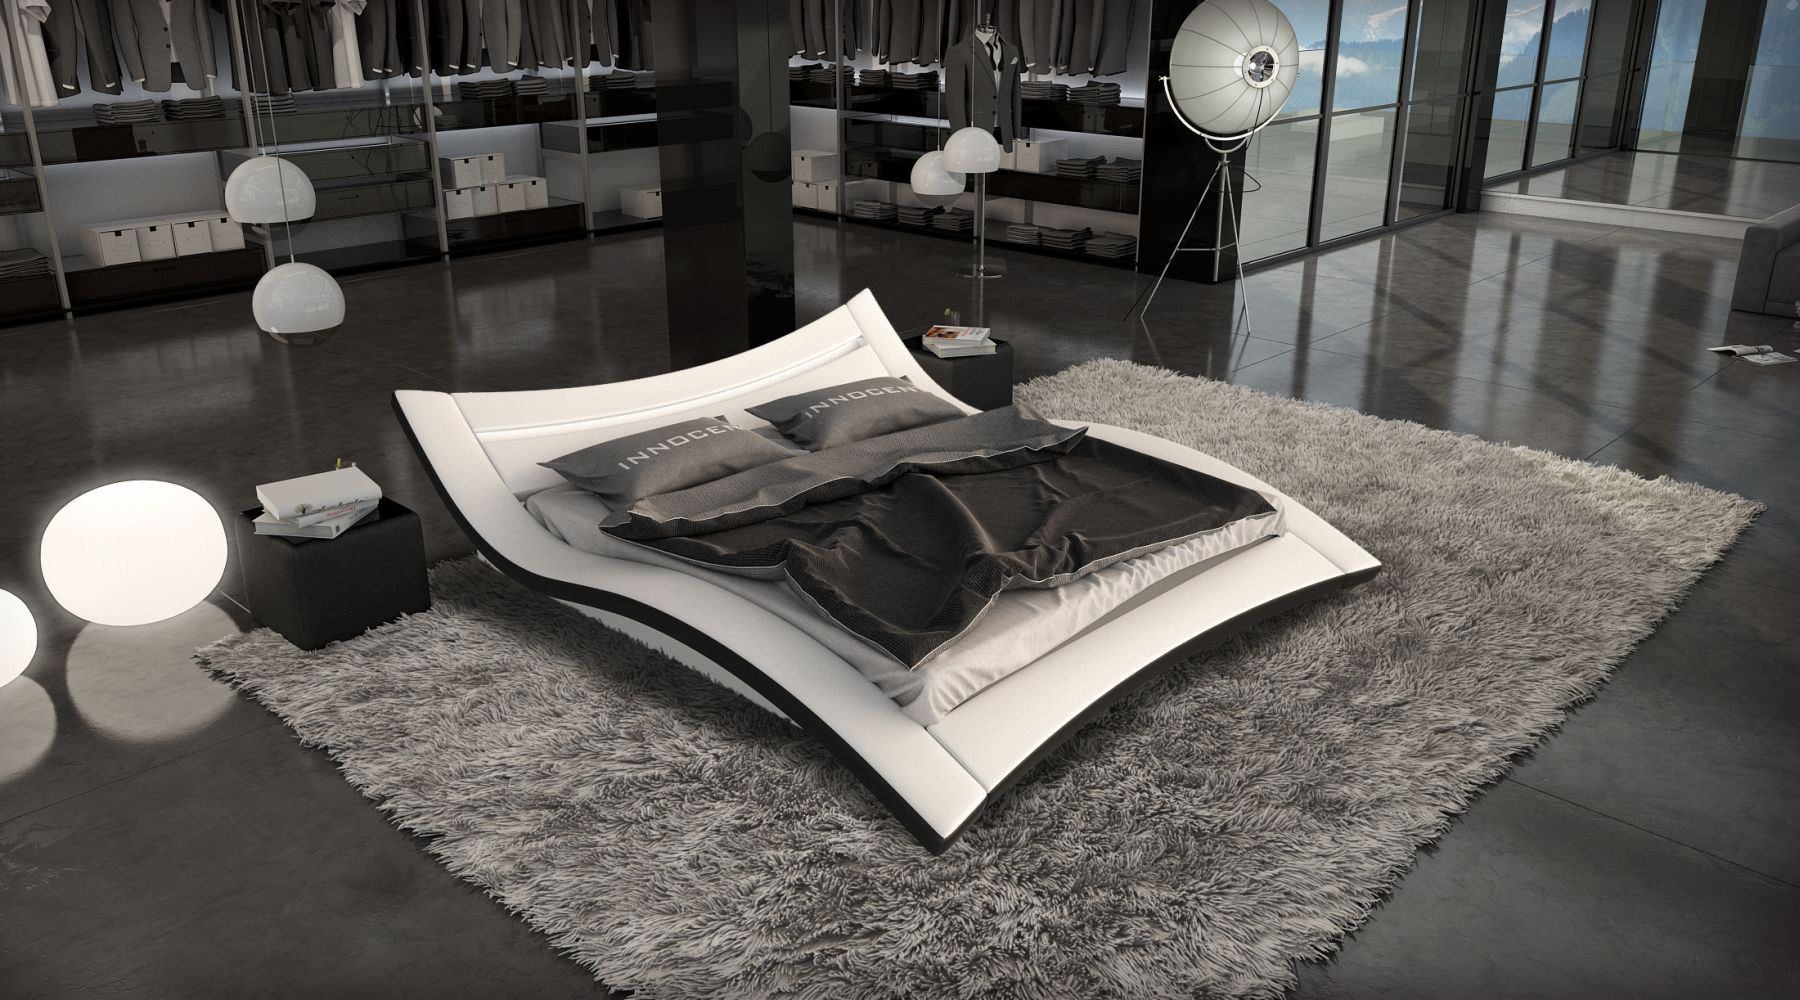 wasserbett ancona mit led beleuchtung komplettset dualsystem ebay. Black Bedroom Furniture Sets. Home Design Ideas